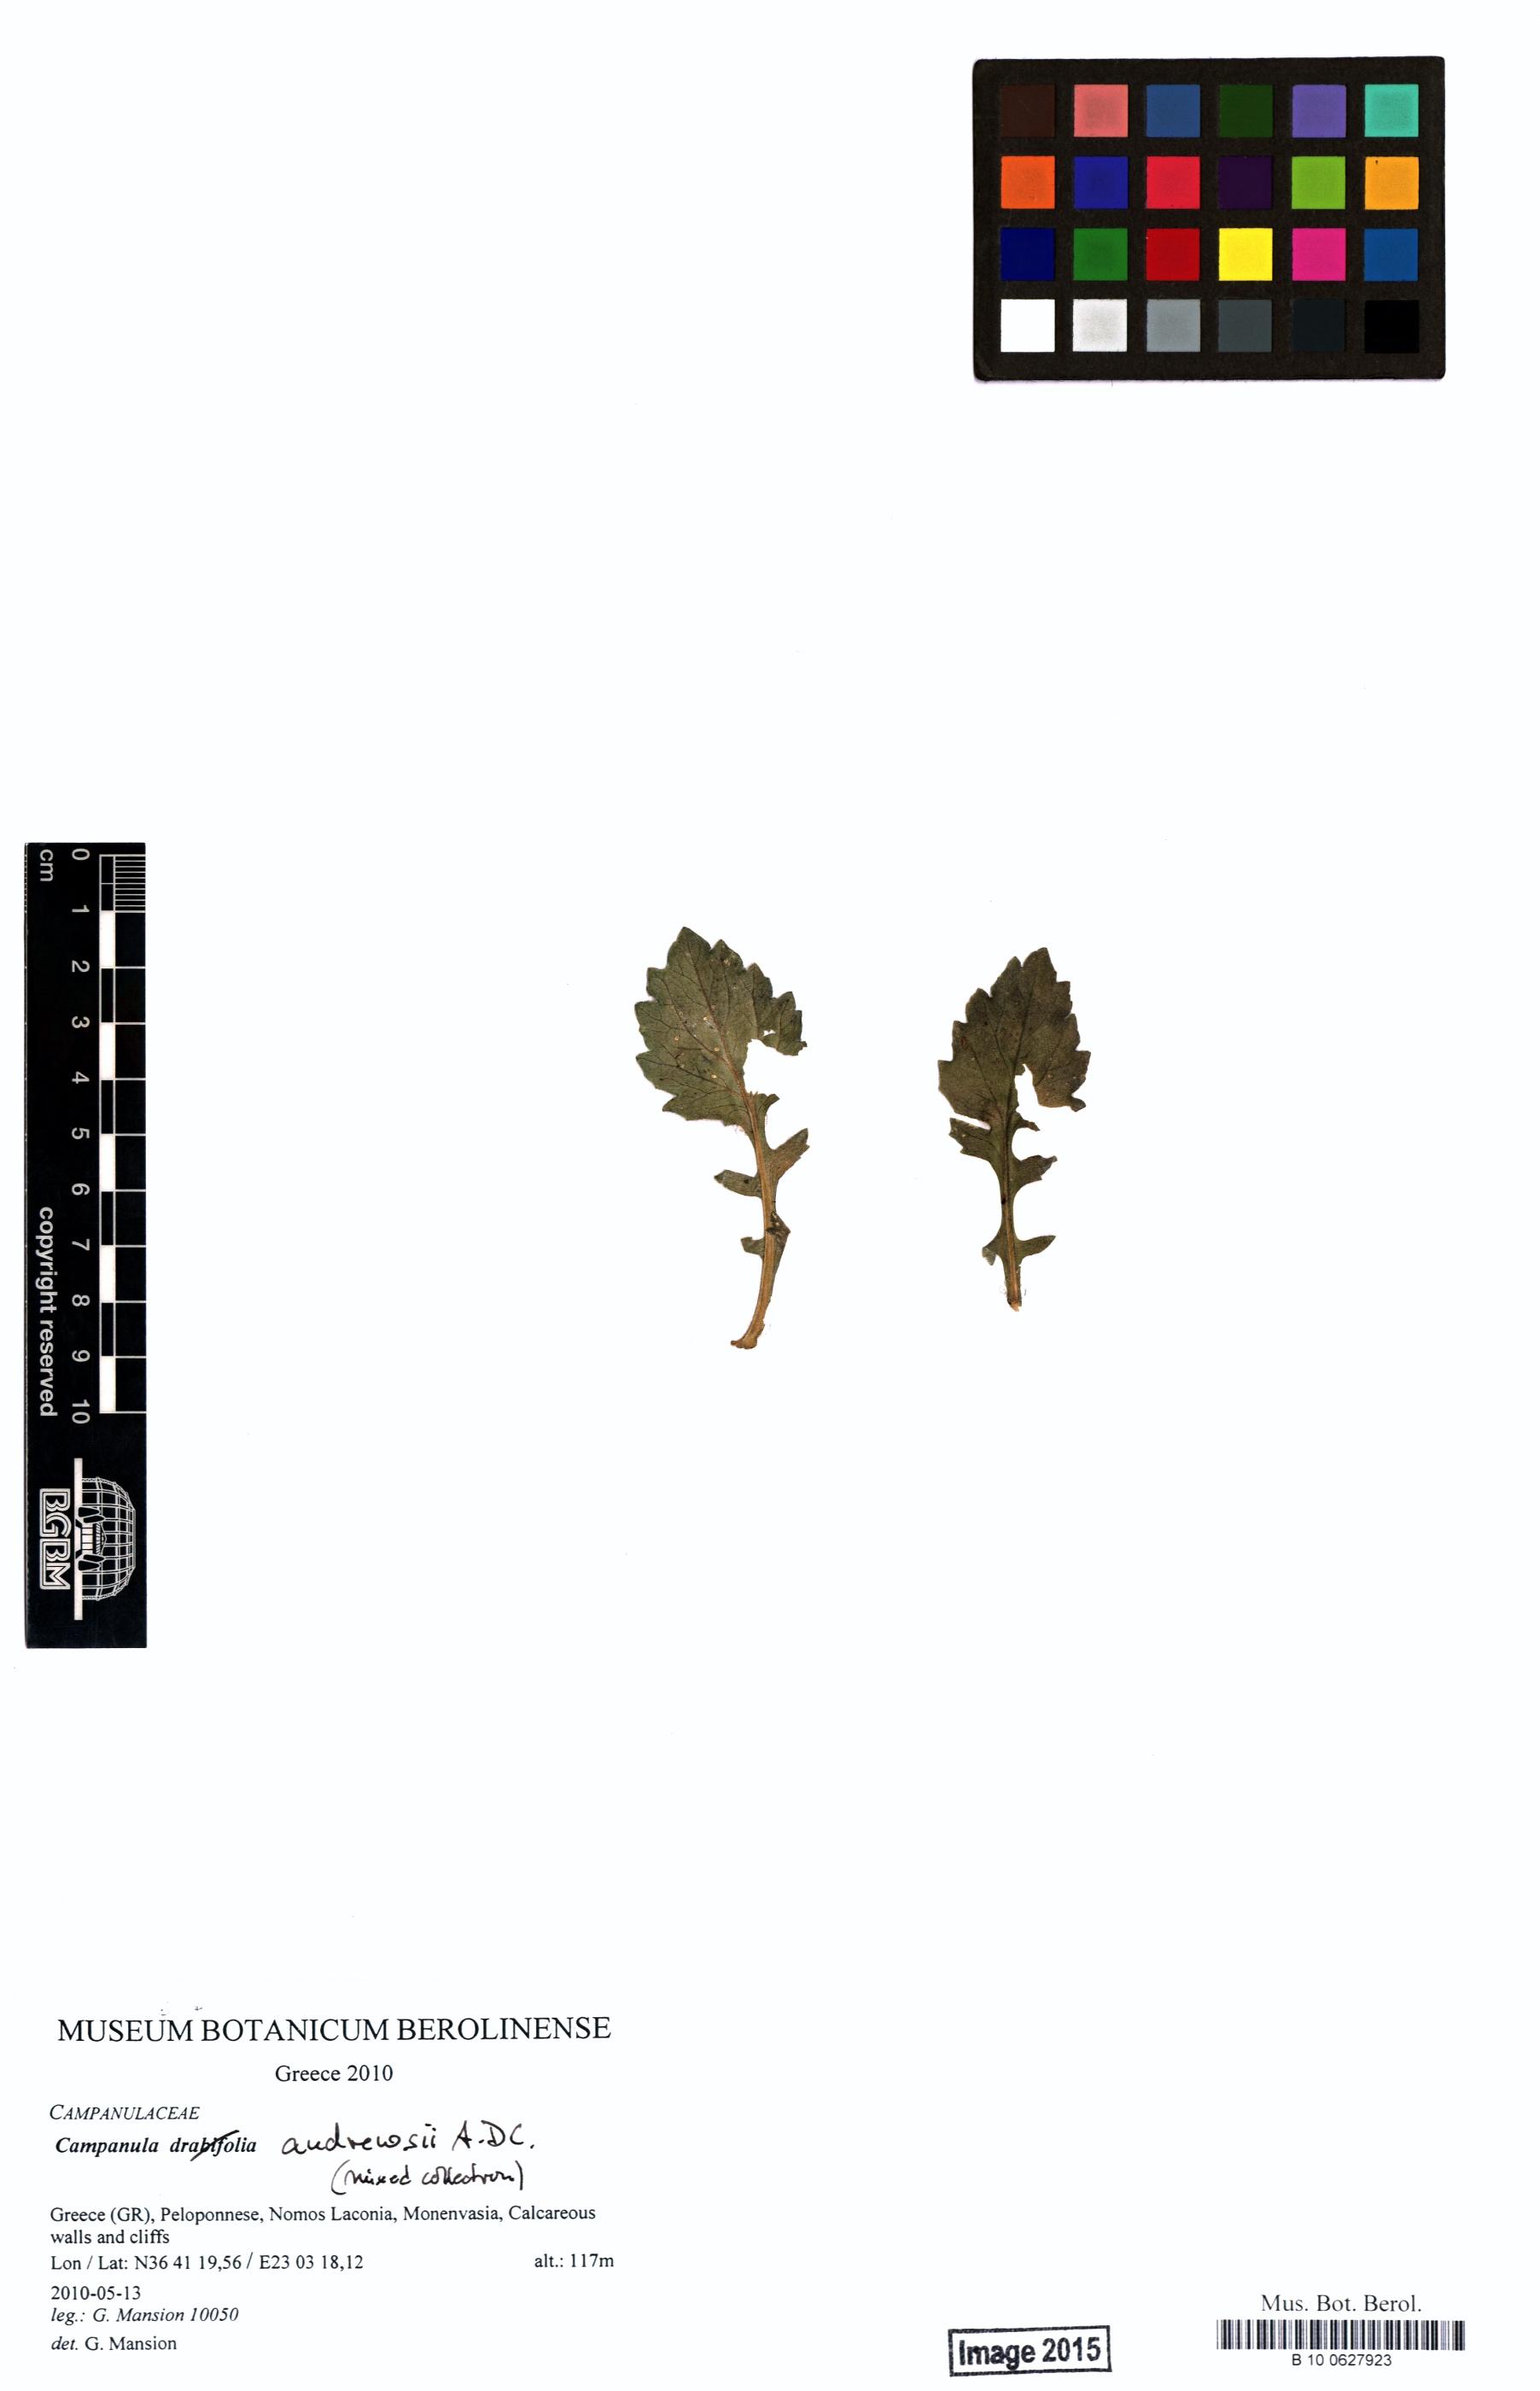 http://ww2.bgbm.org/herbarium/images/B/10/06/27/92/B_10_0627923.jpg